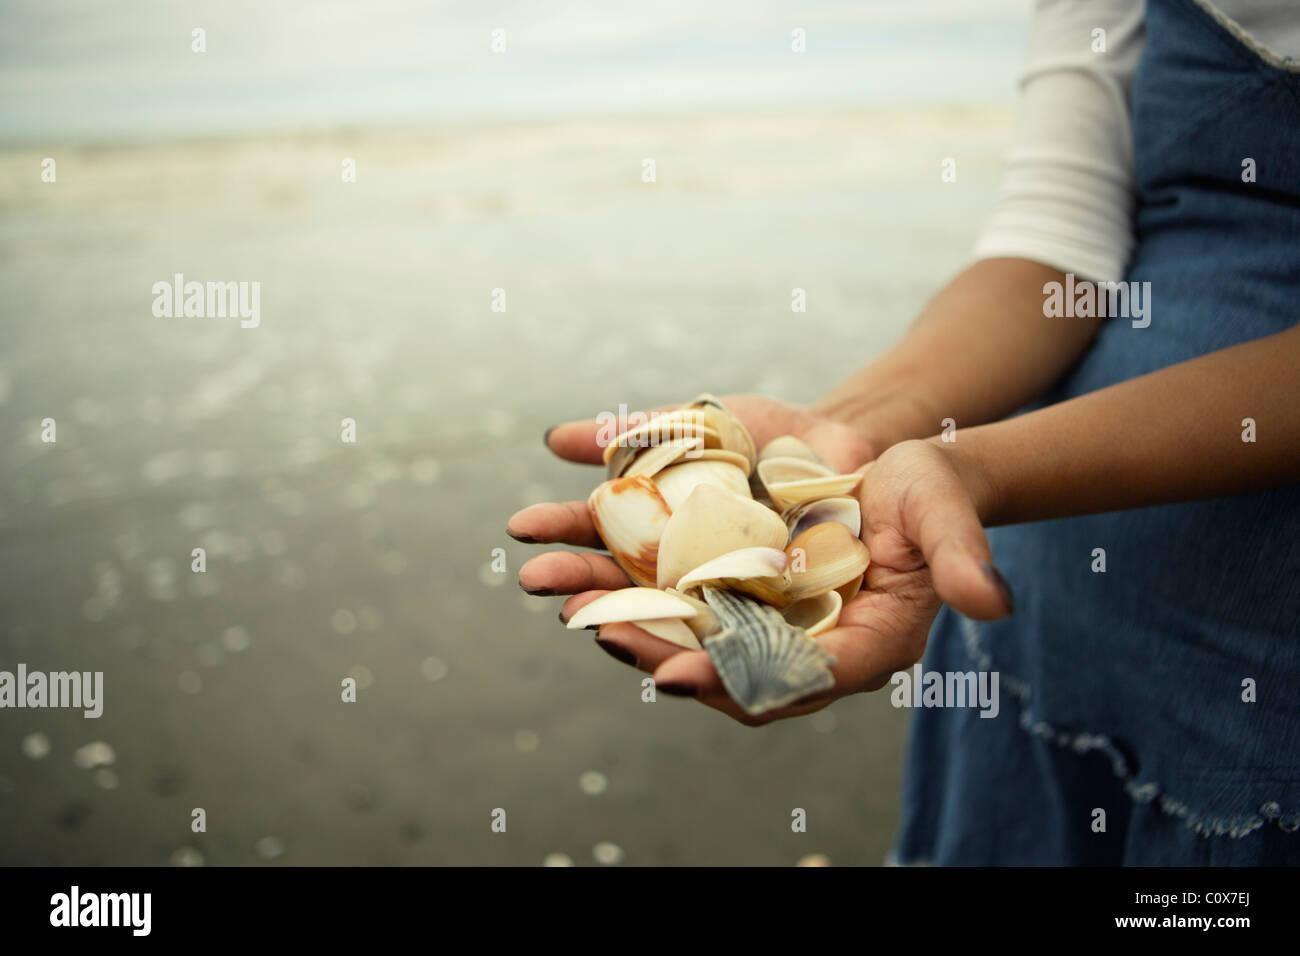 Punjabi donna detiene raccolta di conchiglie da spiaggia, Manawatu Affitto, Nuova Zelanda. Immagini Stock